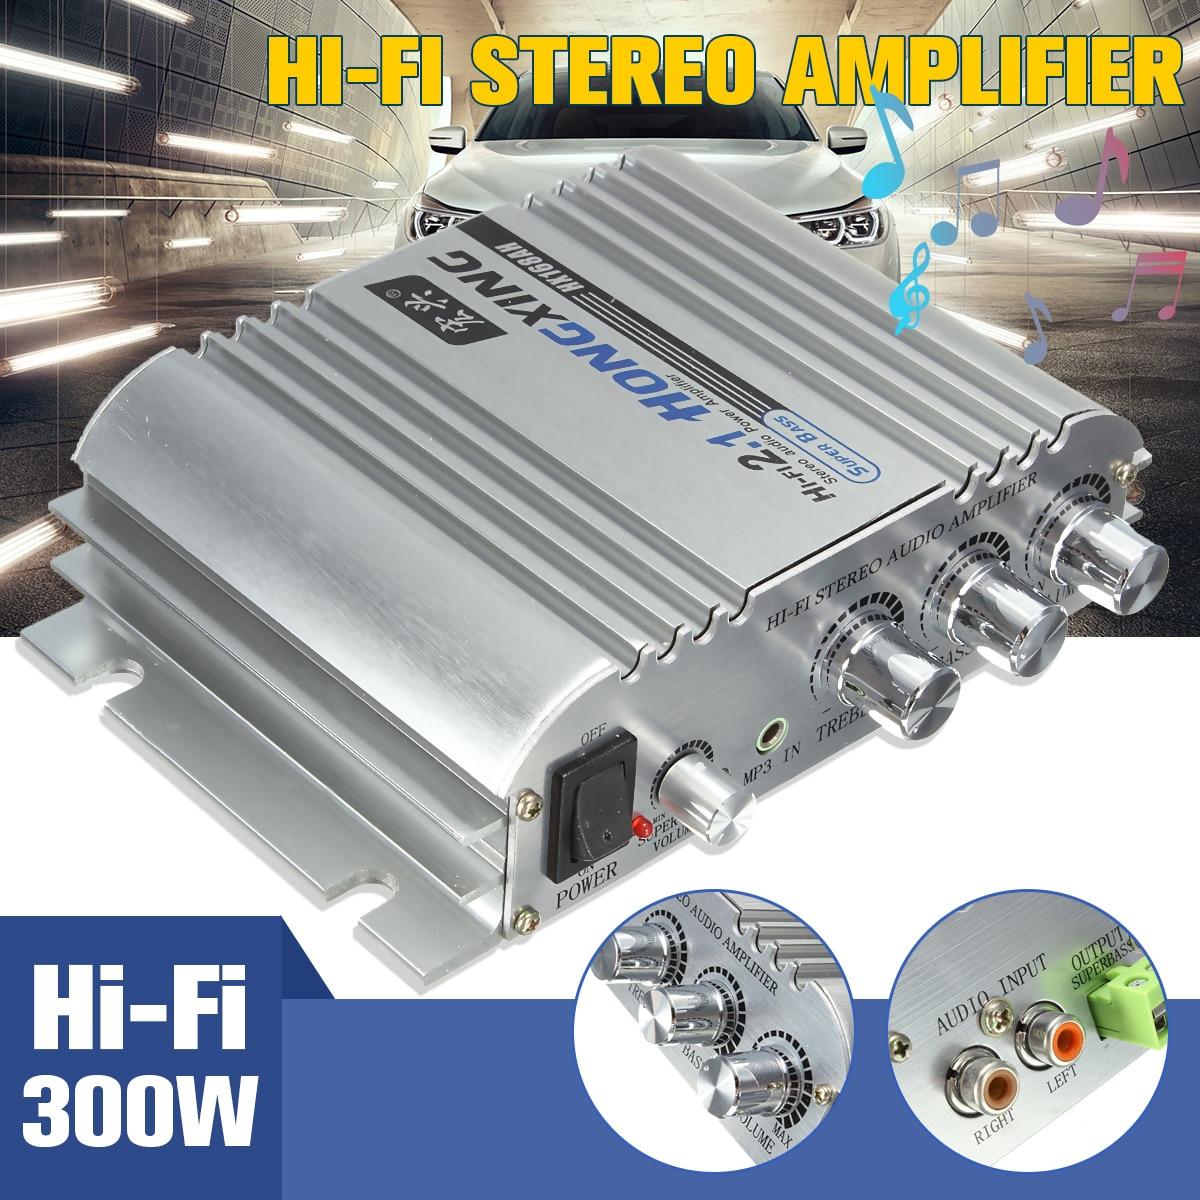 Audew 12V Hi-Fi Stereo Audio Motorcycle Music Amplifier AMP 2+1 CH Super Bass Ca